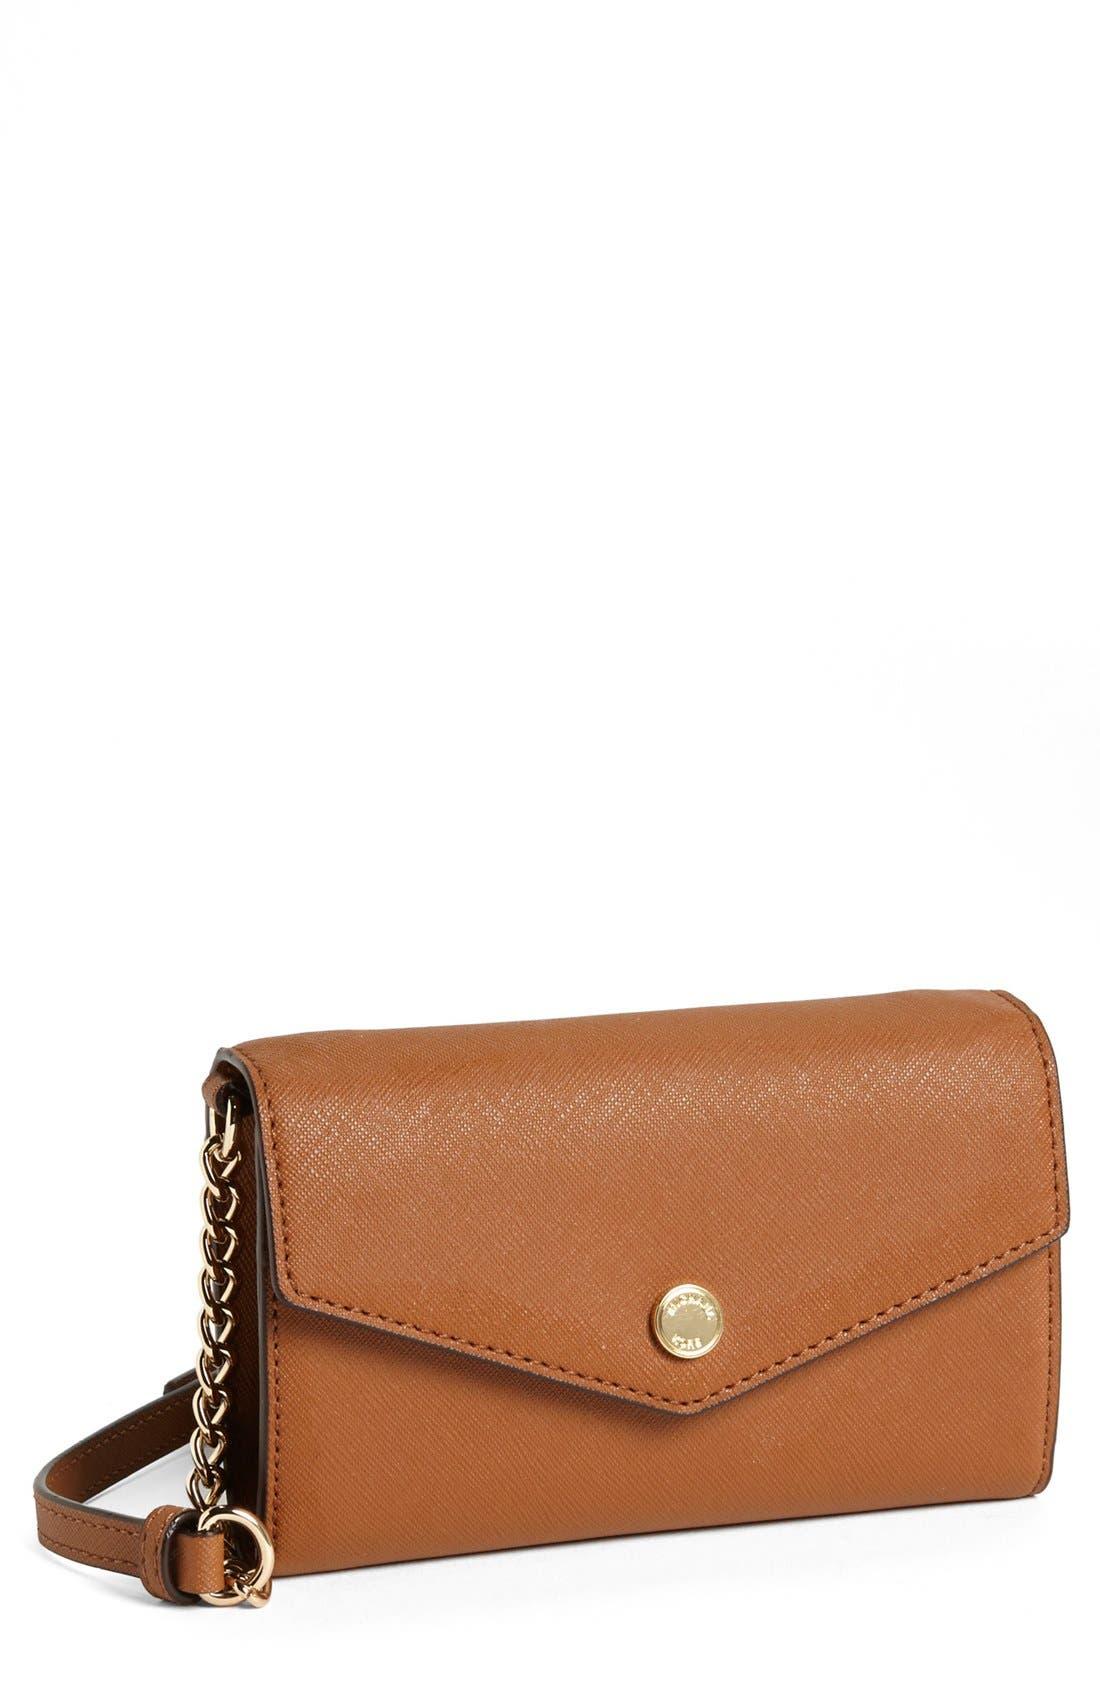 Main Image - MICHAEL Michael Kors Crossbody Phone Bag